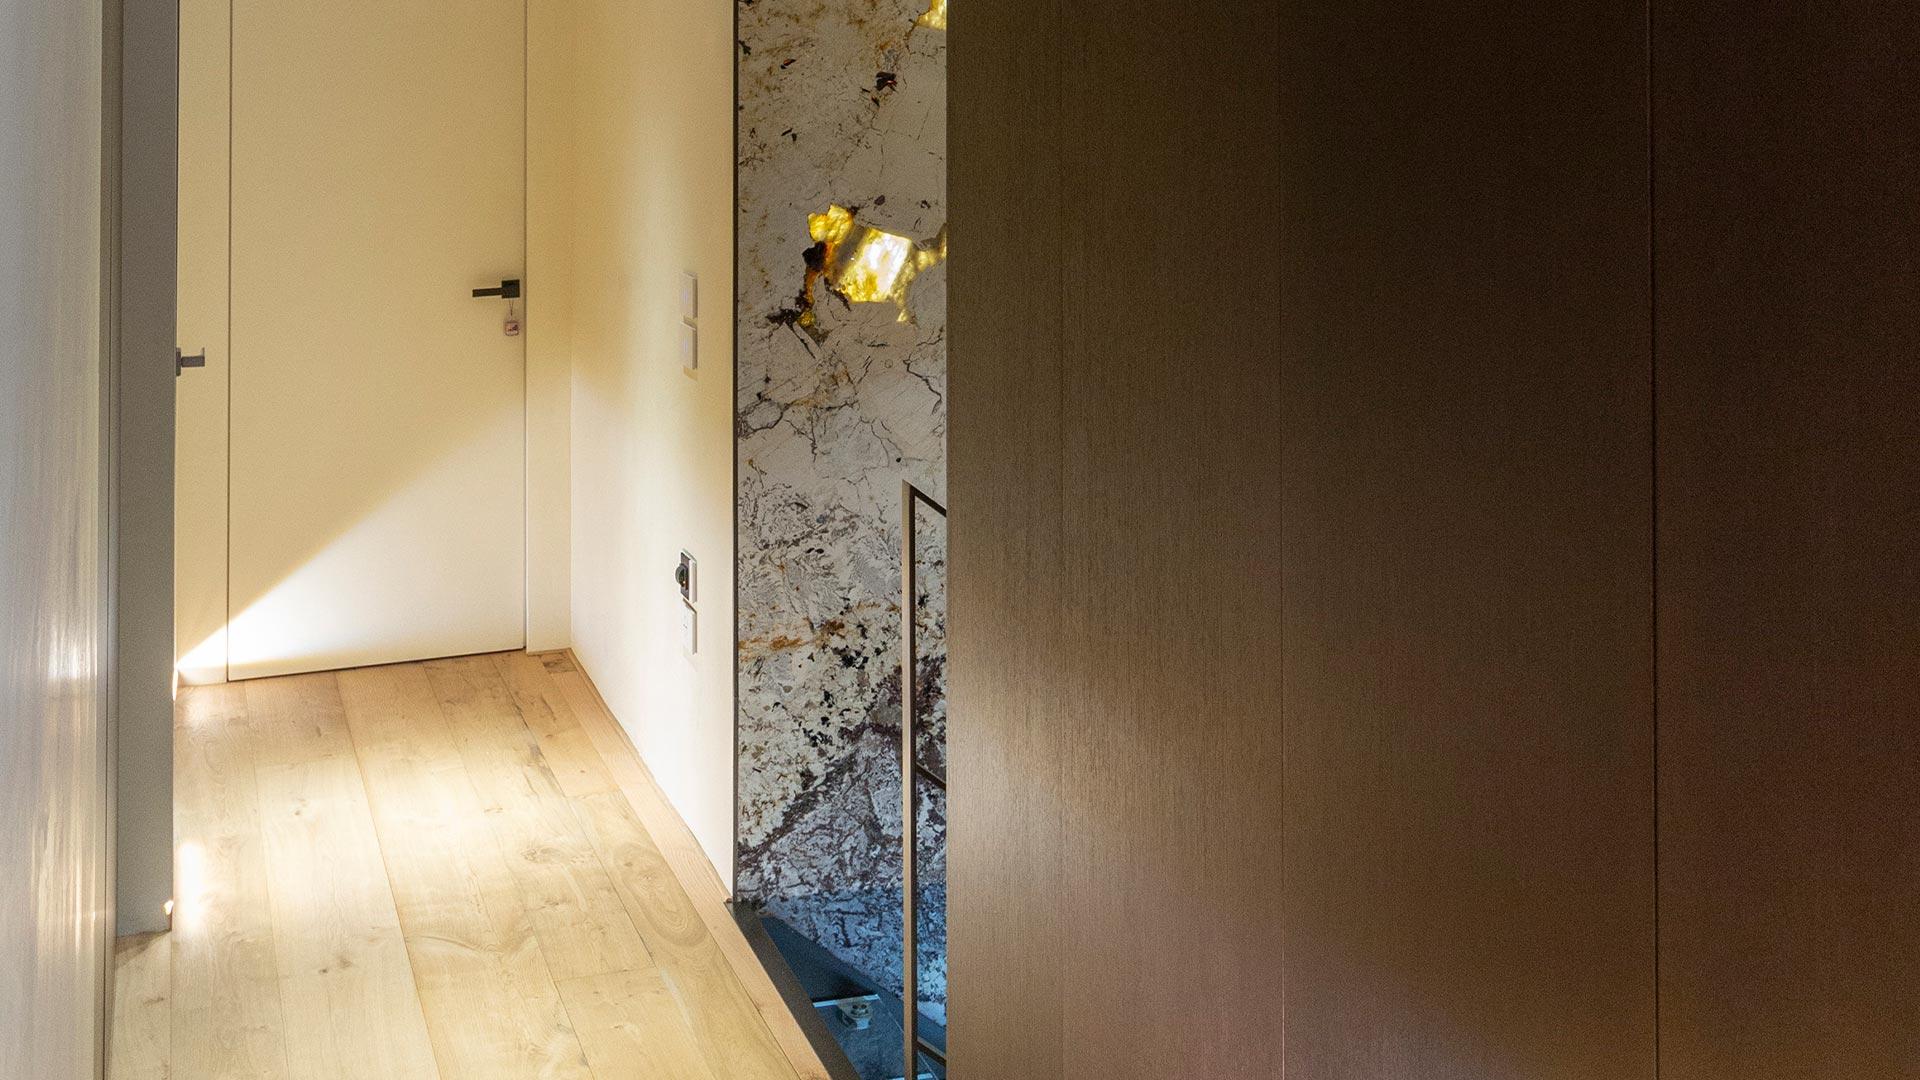 Turnkey bespoke interiors in Treviso realized by TM Italia - 202105_Bespoke_contract_Treviso-018